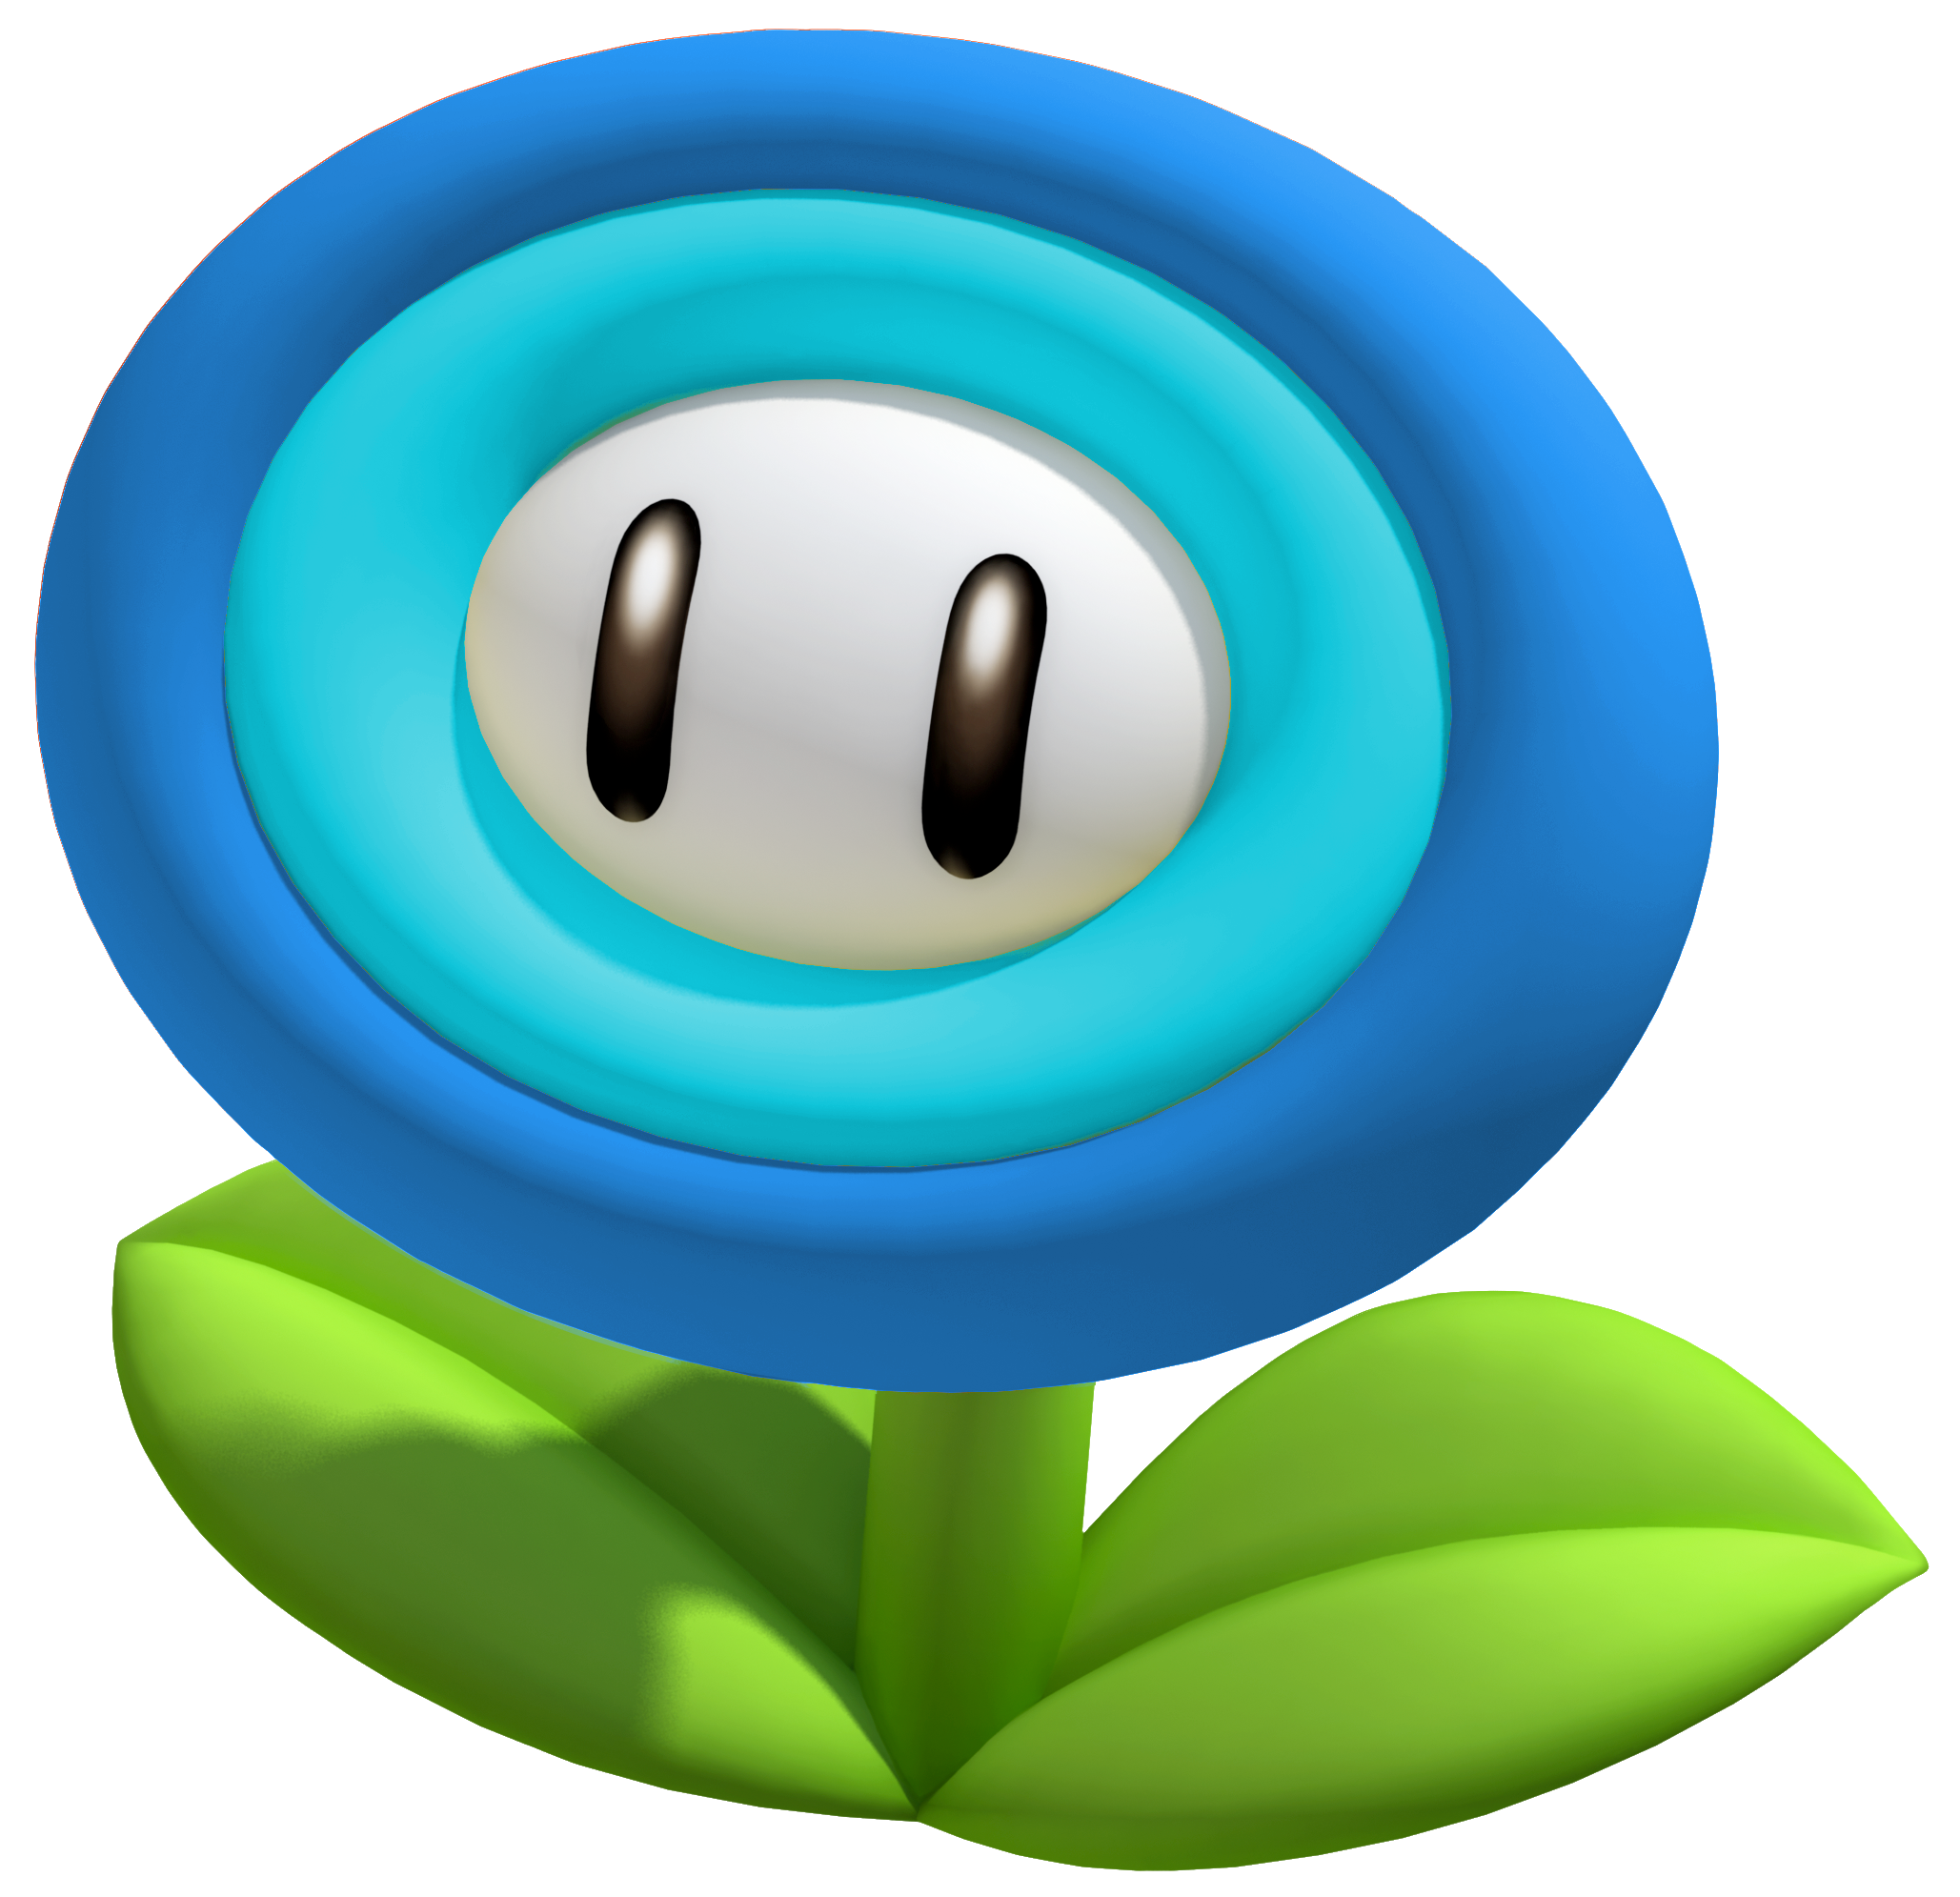 New Super Mario Bros Damaged Fantendo The Video Game